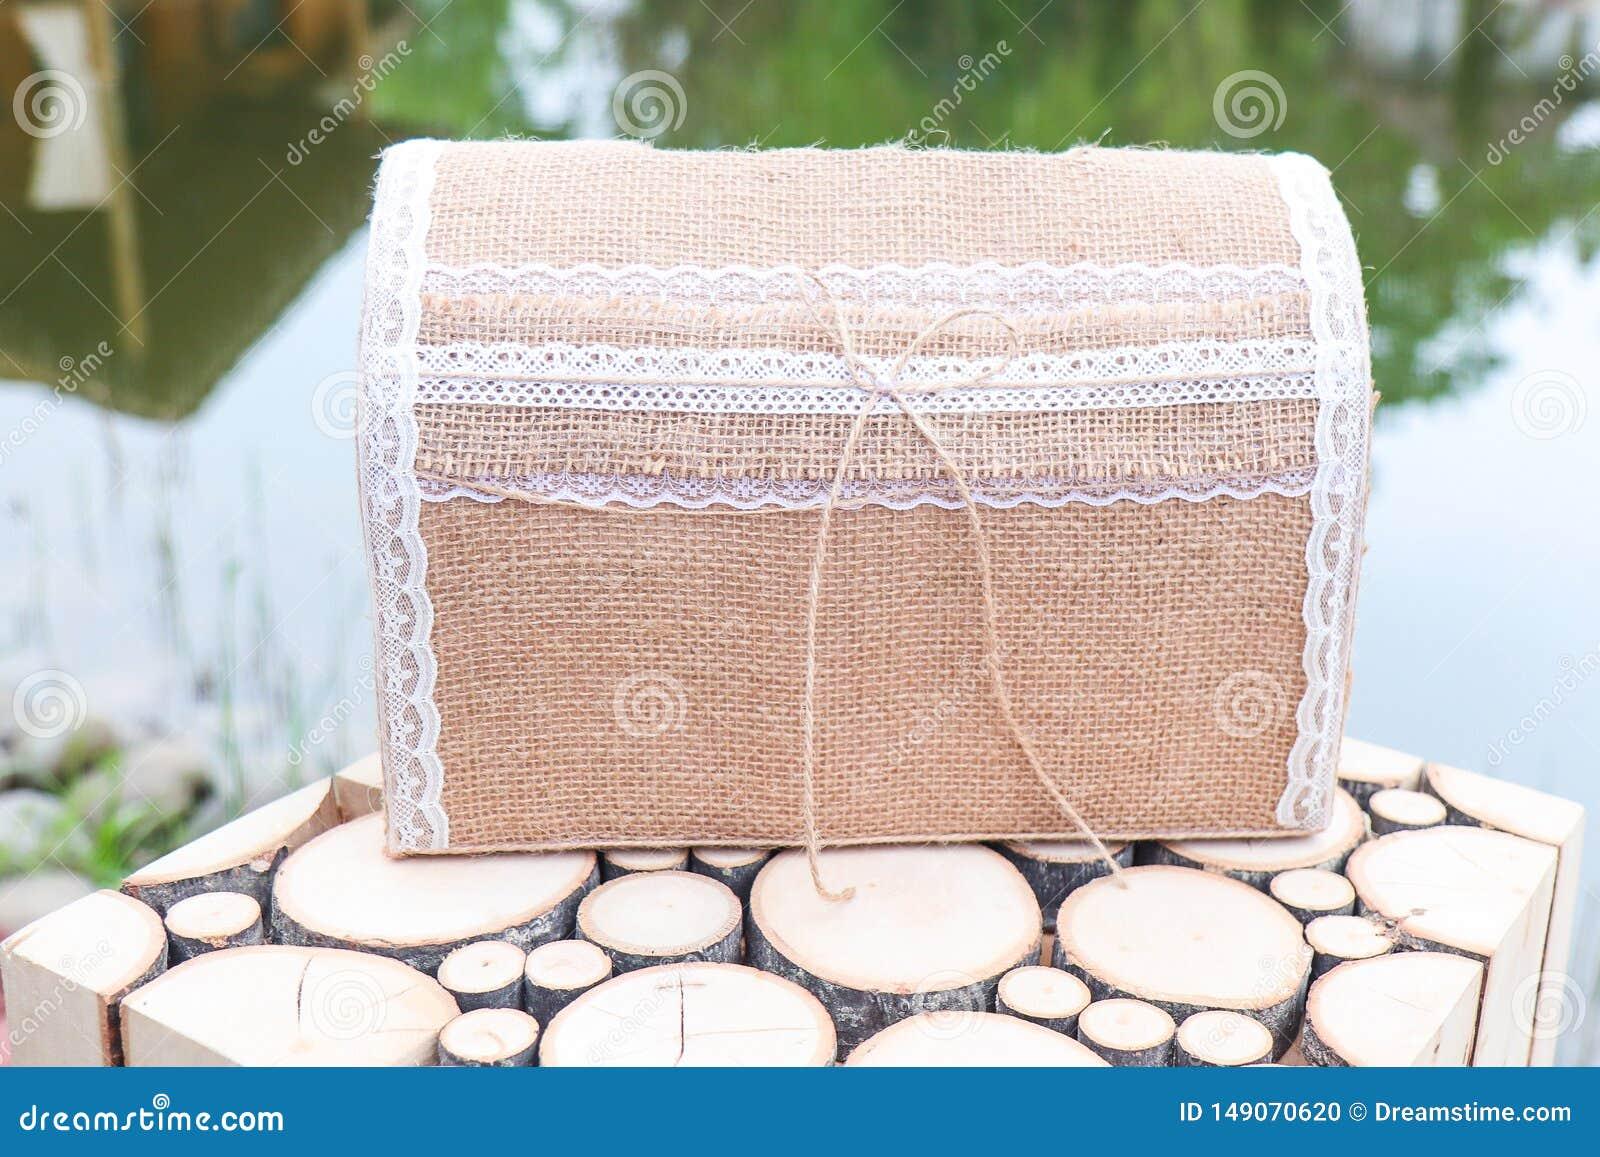 Vintage box for money at the wedding. Handmade Newlyweds Money Box